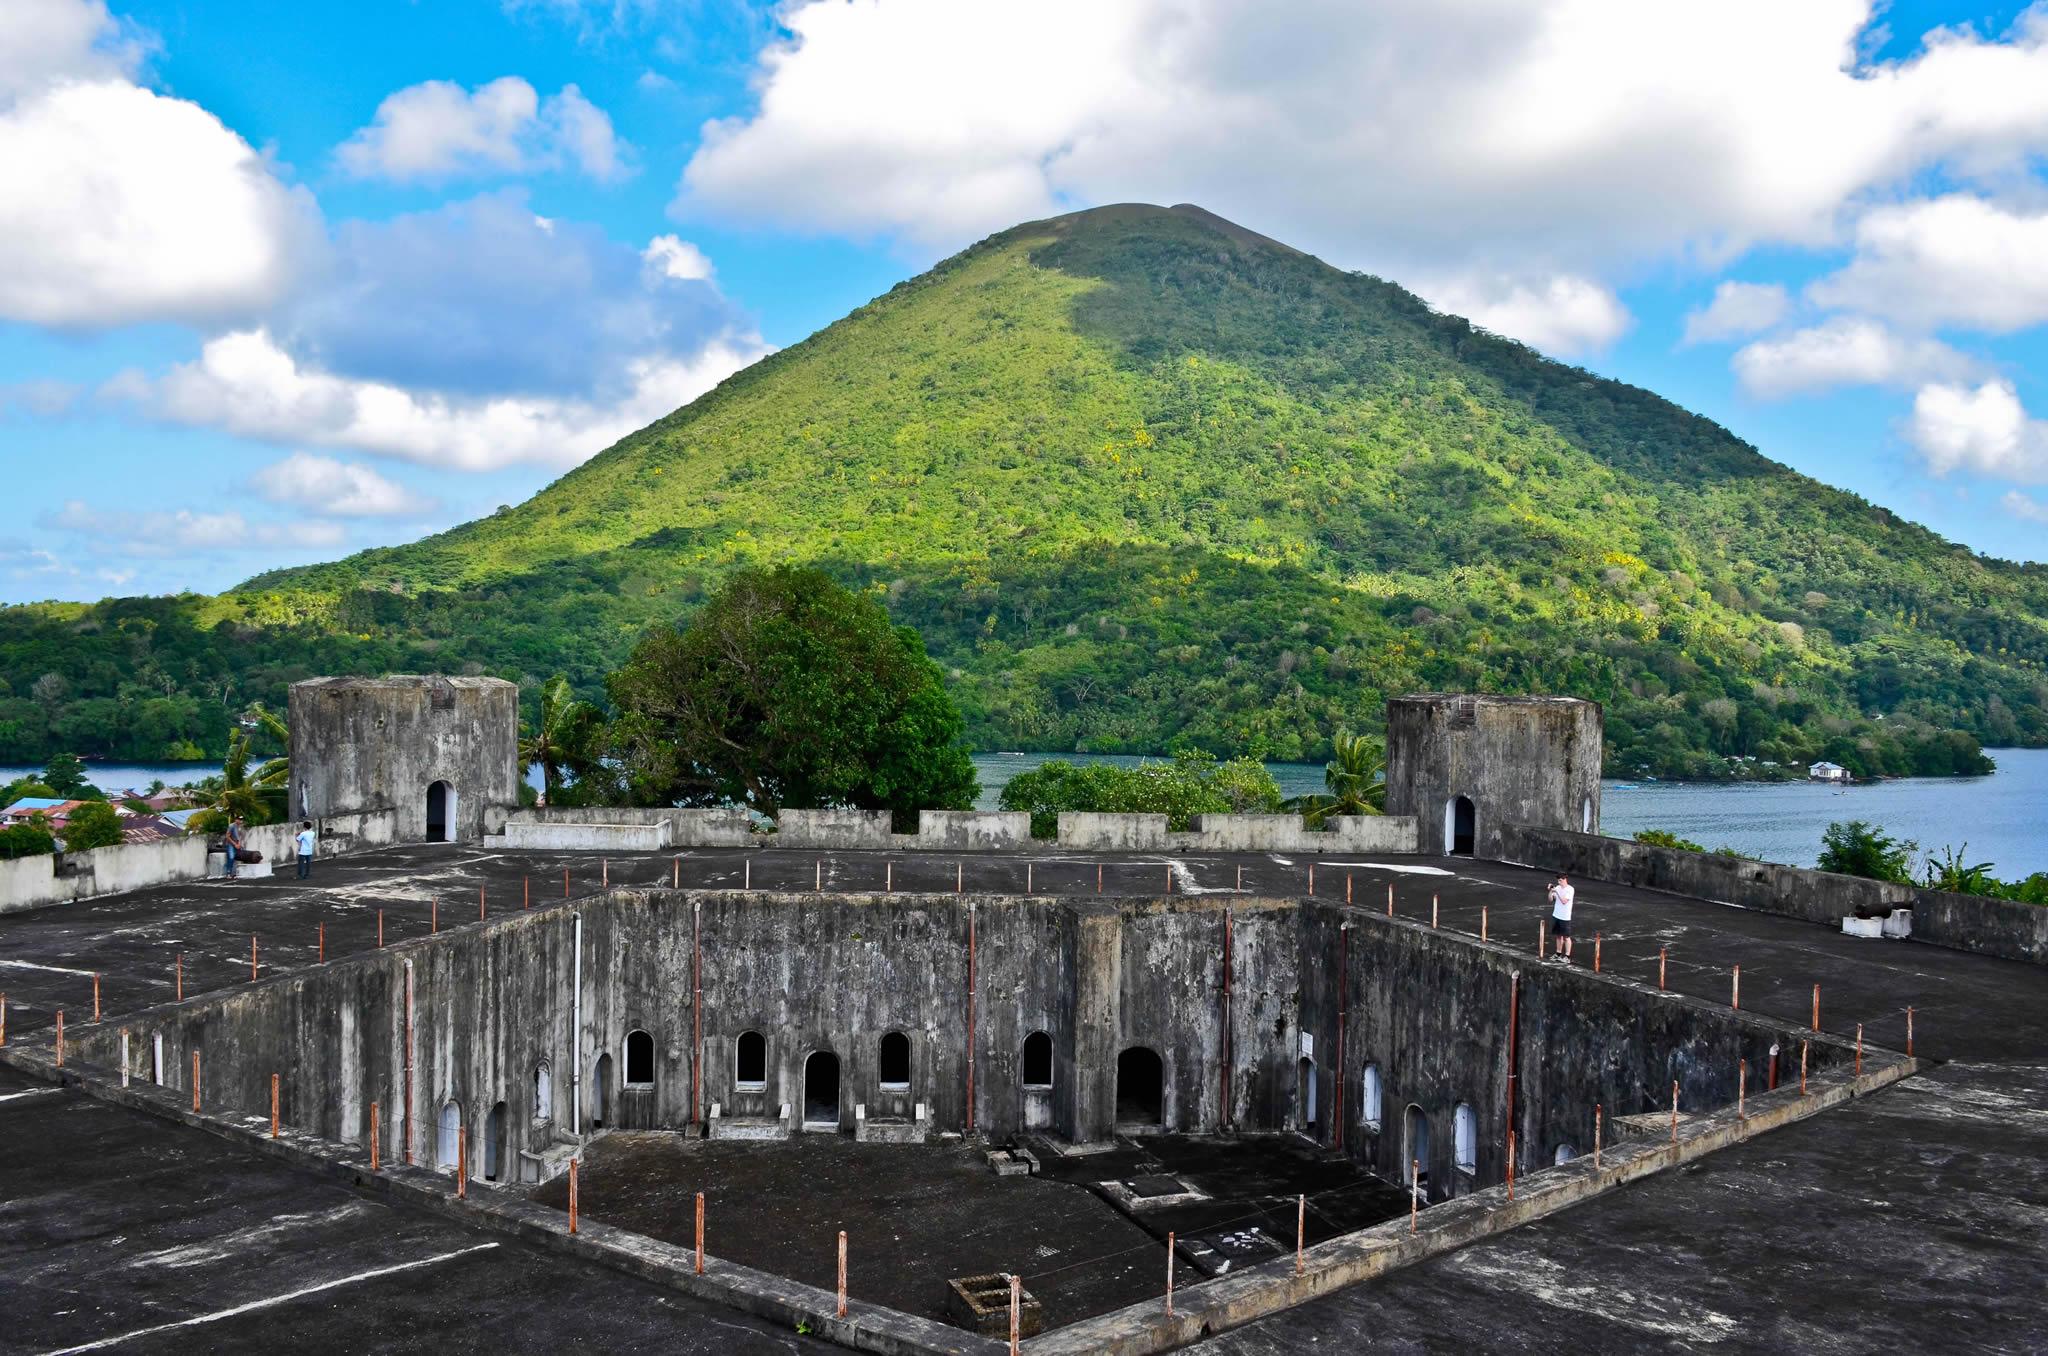 Fort Belgica, overseeing the Gunung Api volcano. Image : Wikipedia